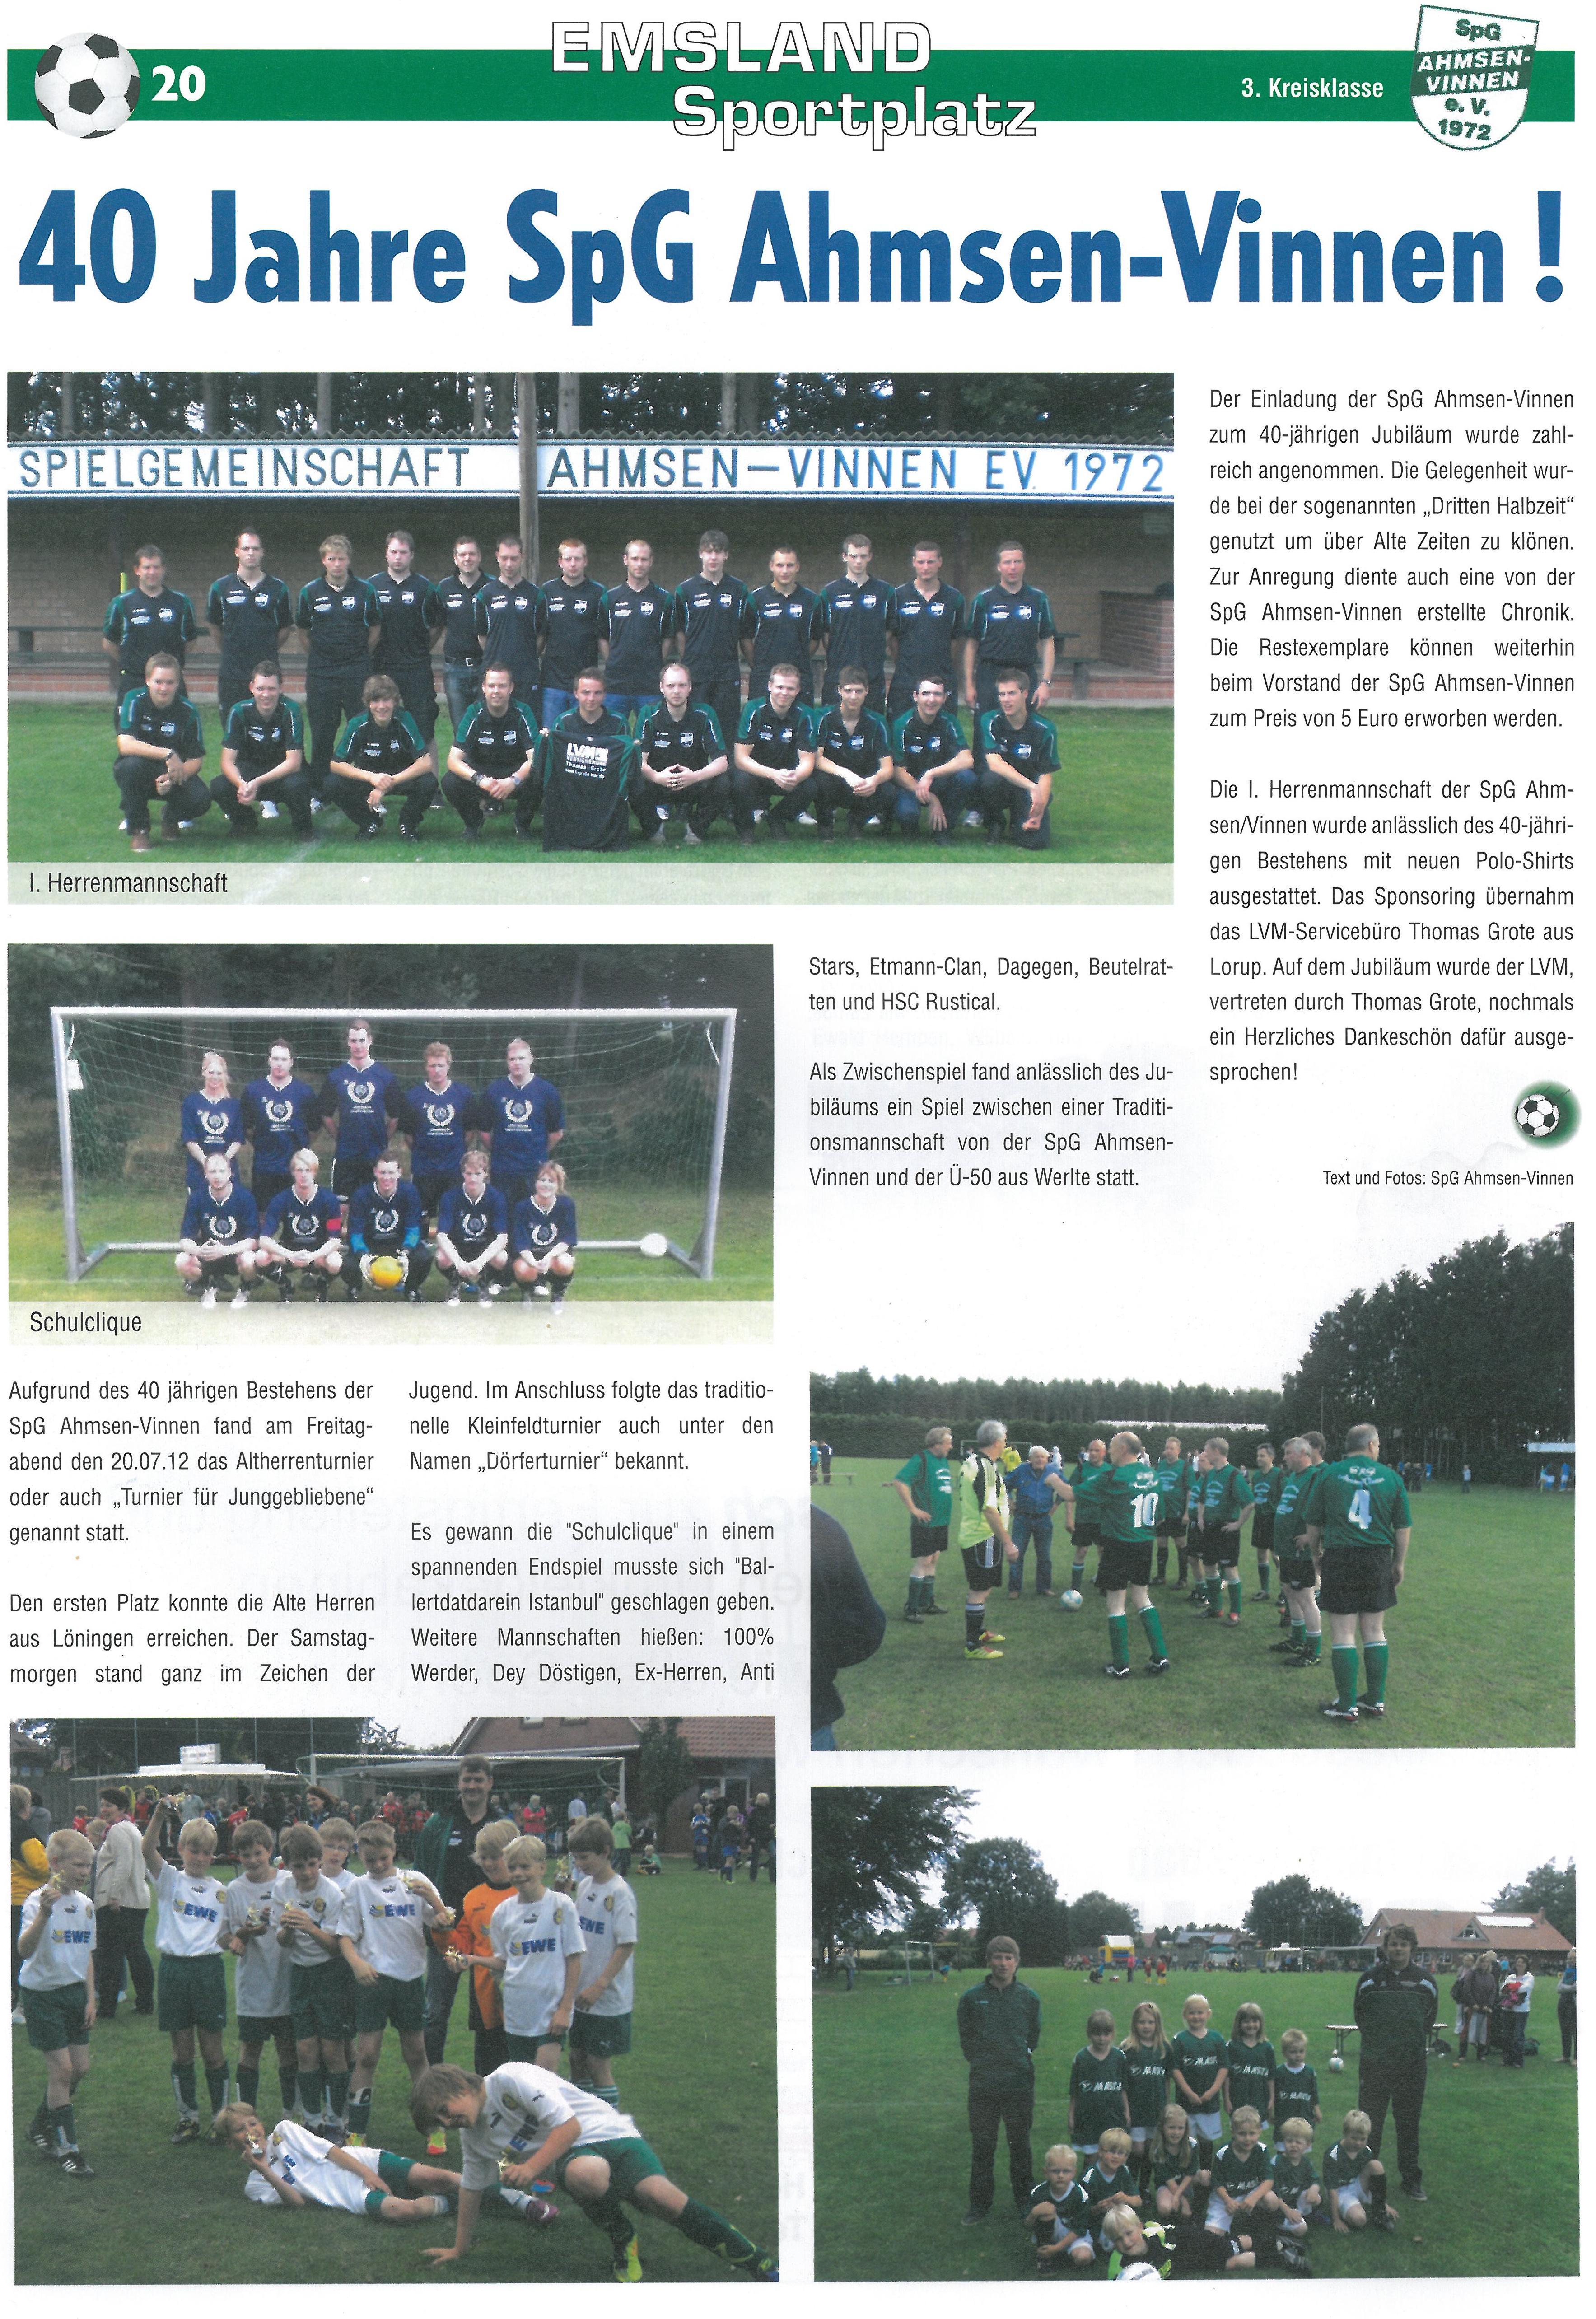 Emsland Sportplatz Nov.-Dez.2012  40 Jahre